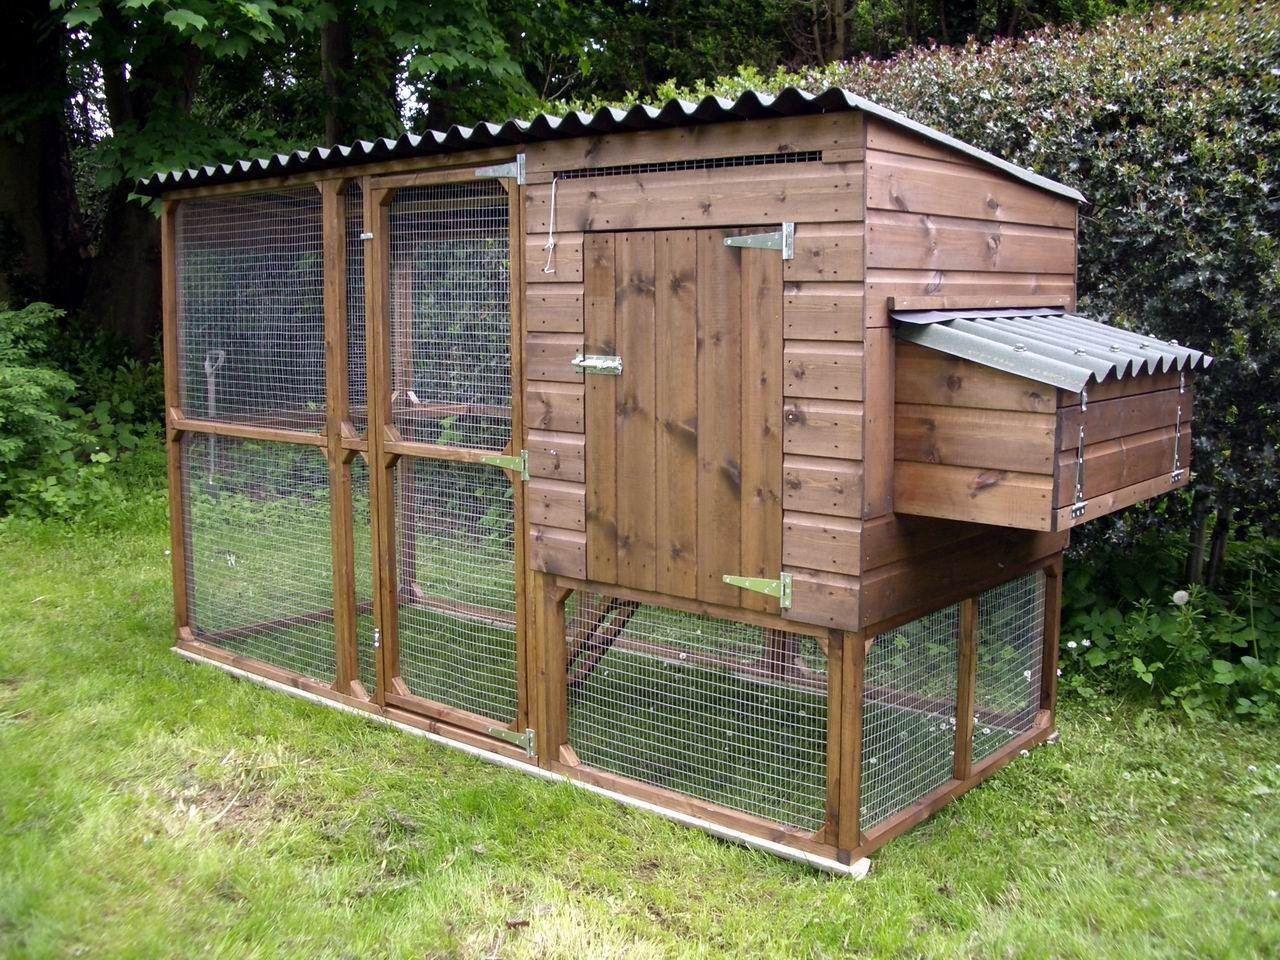 Chicken Coop Blueprints And Plans james_chicken_hen